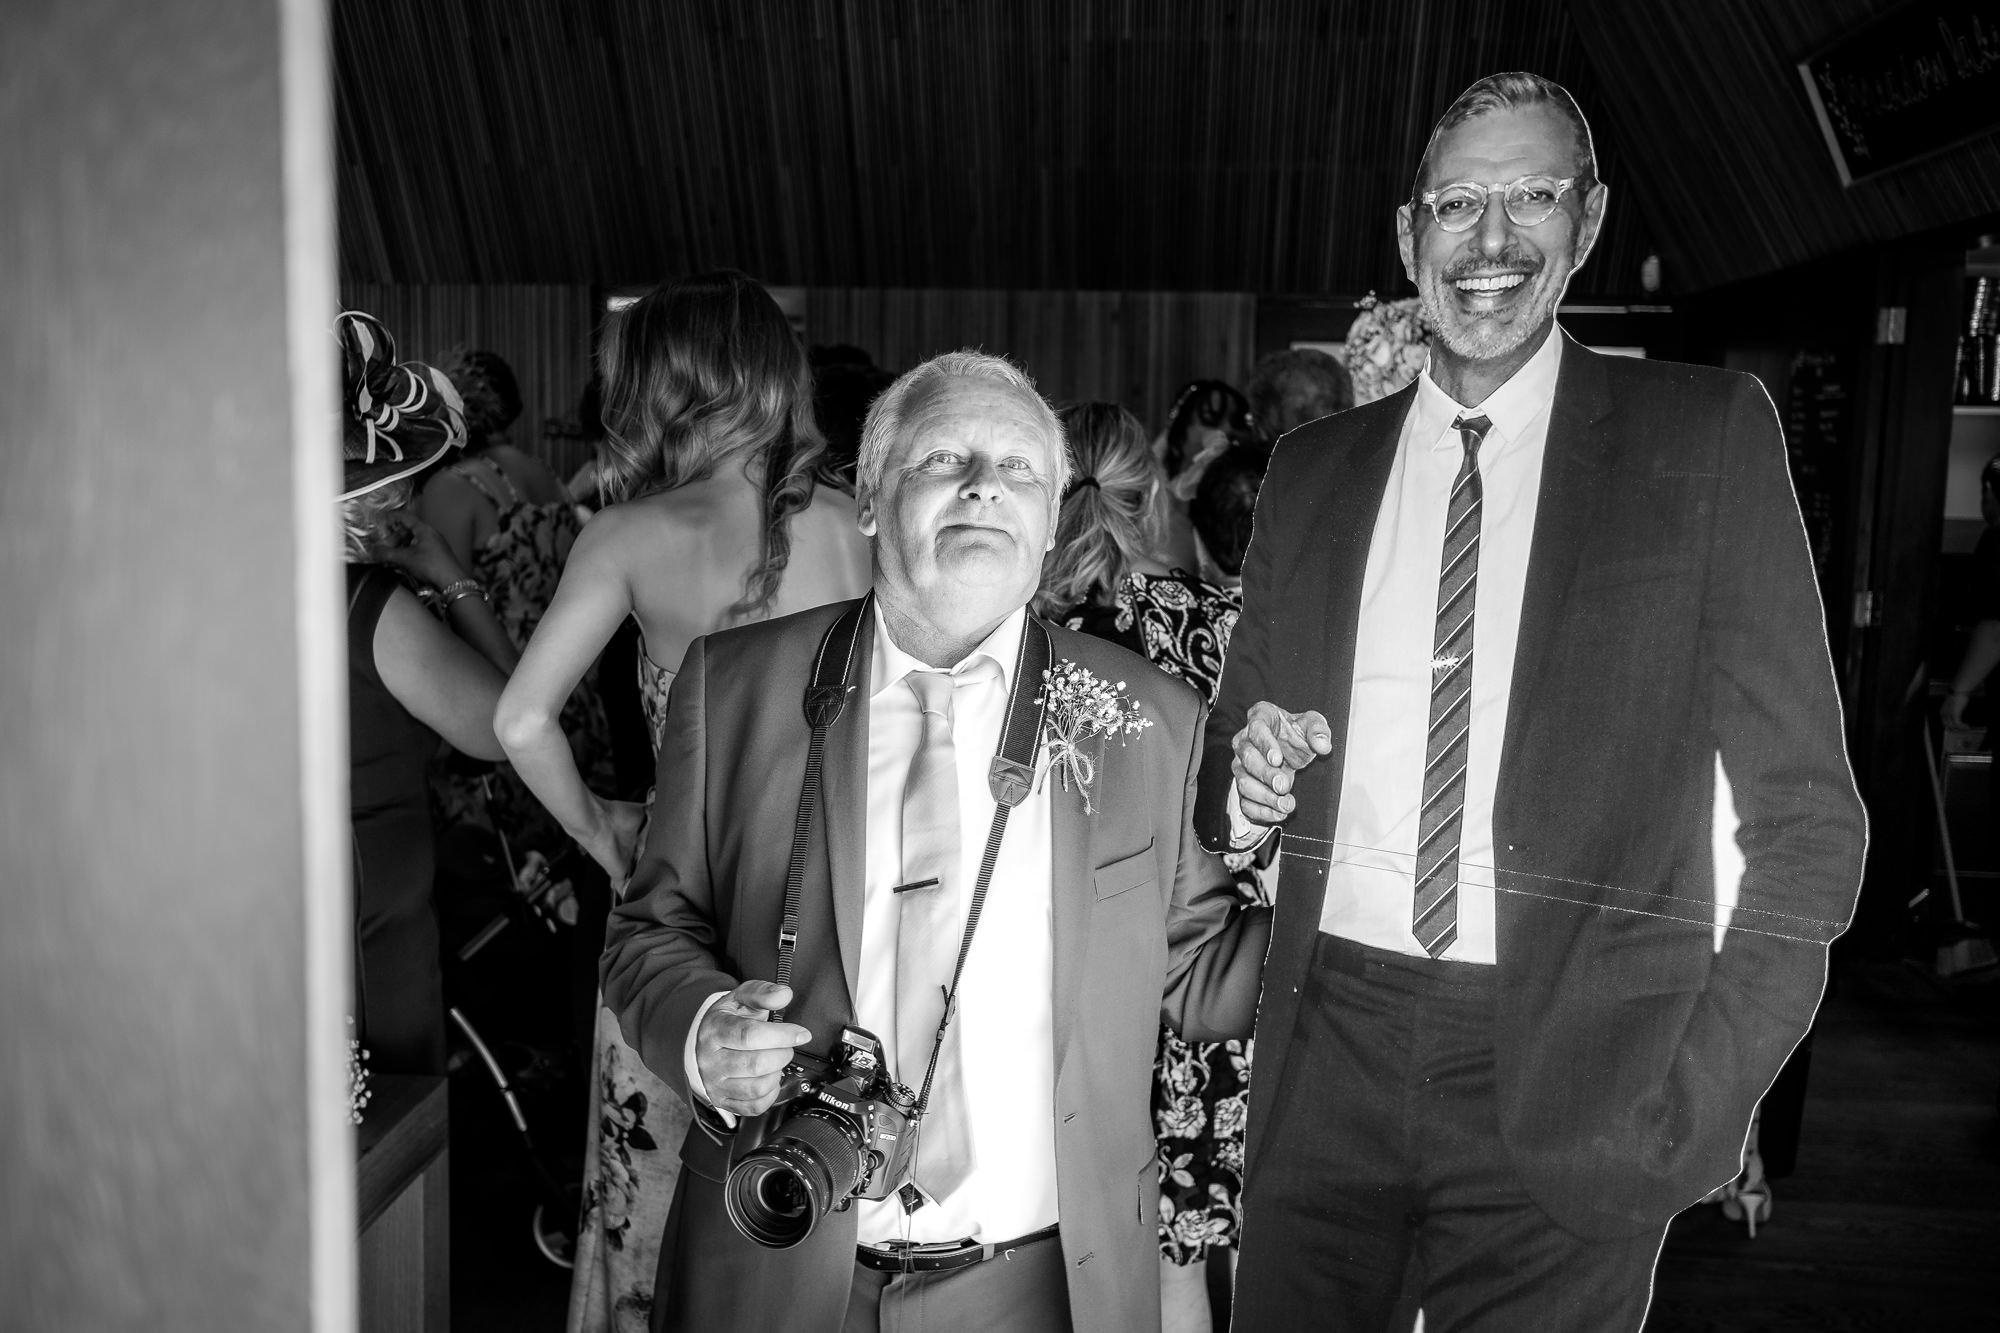 jeff goldblum cutout with brides dad